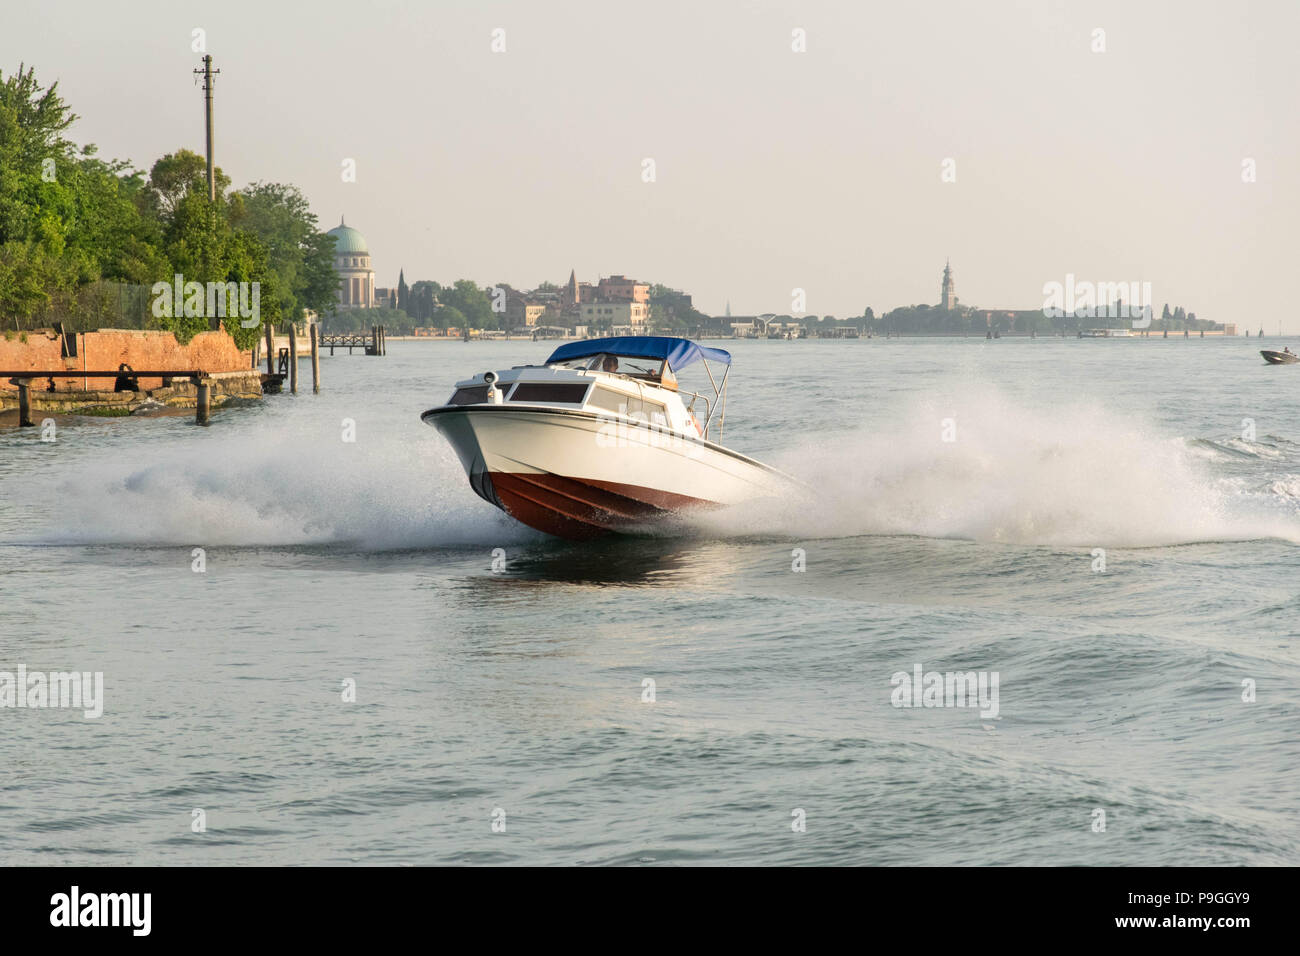 Europe, Italy, Veneto, Venice. Fast motorboat breaking waves. LagUne di Venezia nealr Lido di Venezia. Big water splash. - Stock Image